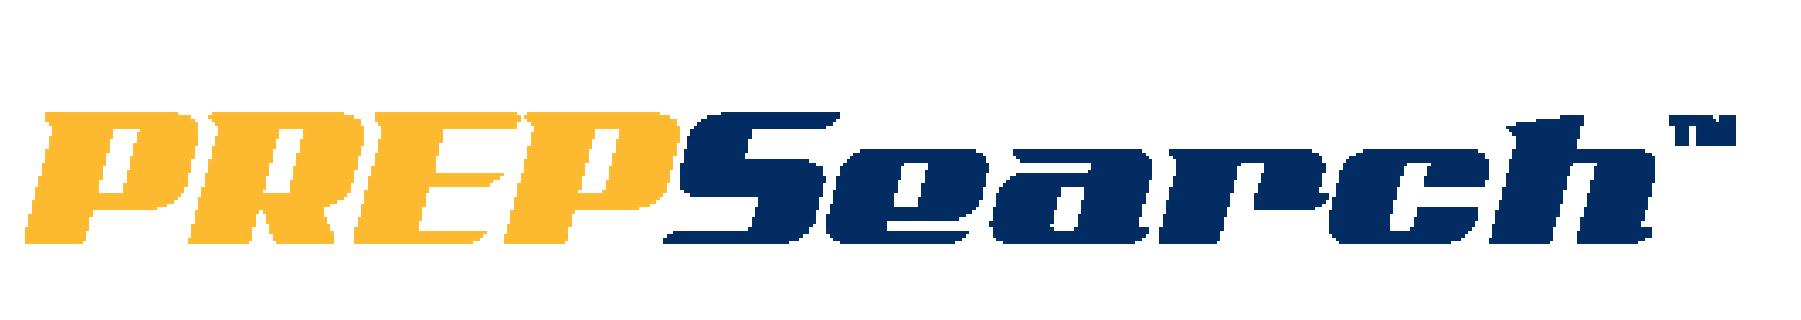 Enzley Mitchell IV - PREPSearch Logo2017-01